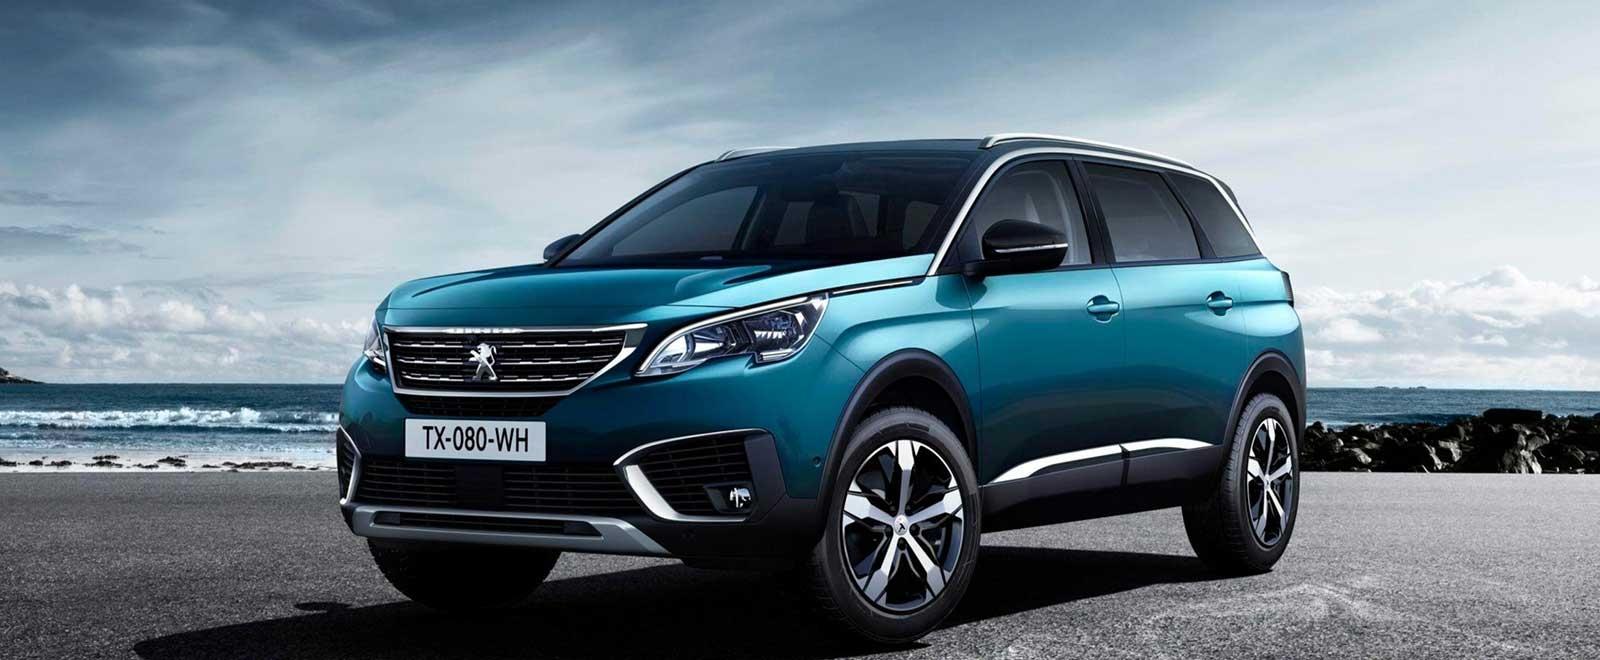 Cfao Motors Peugeot Mauritanie